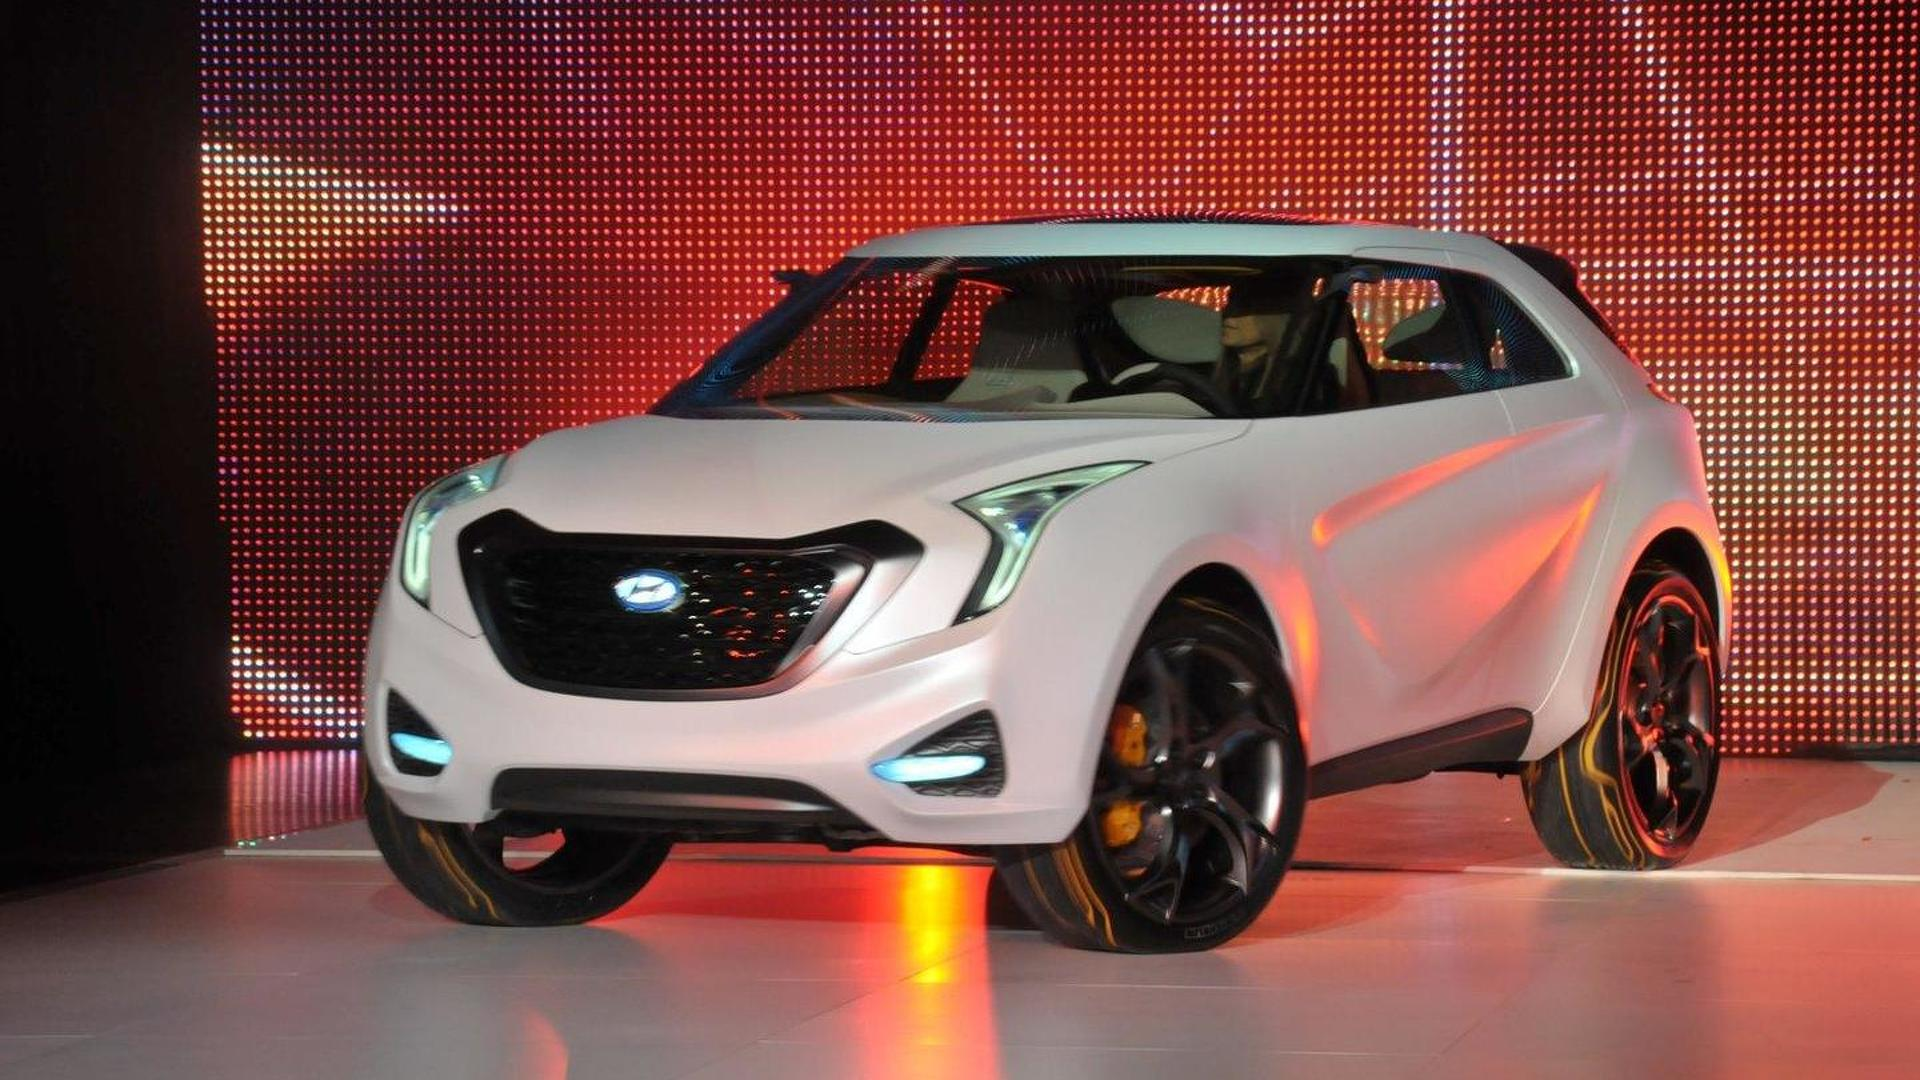 Hyundai confirms nissan juke rival for 2017 for Hyundai motor company usa